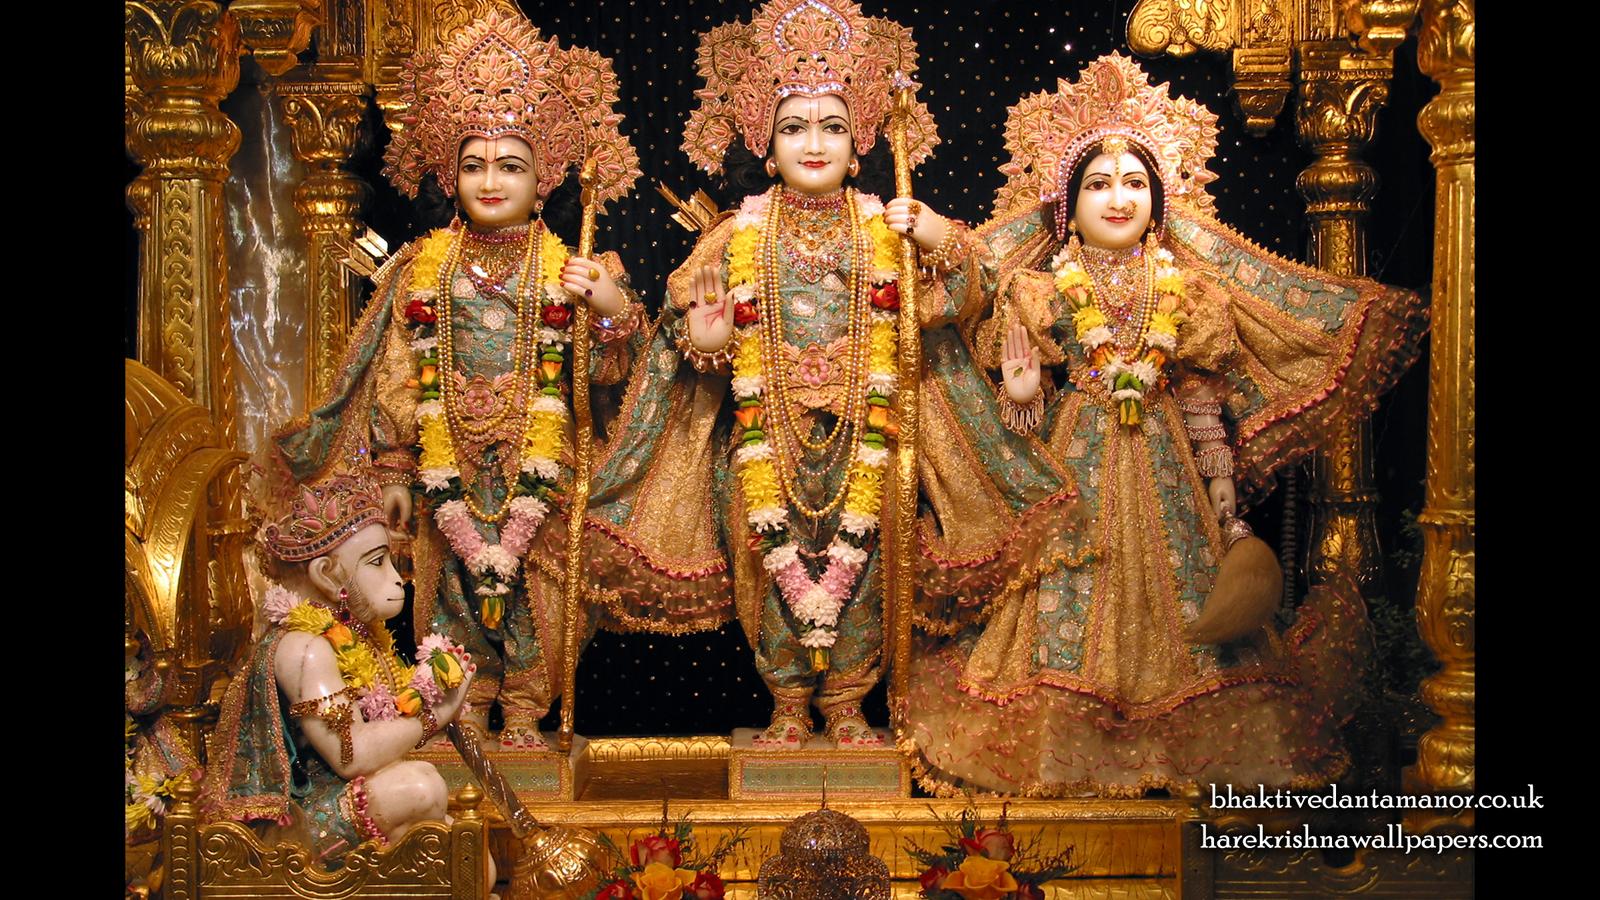 Sri Sri Sita Rama Laxman Hanuman Wallpaper (003) Size 1600x900 Download